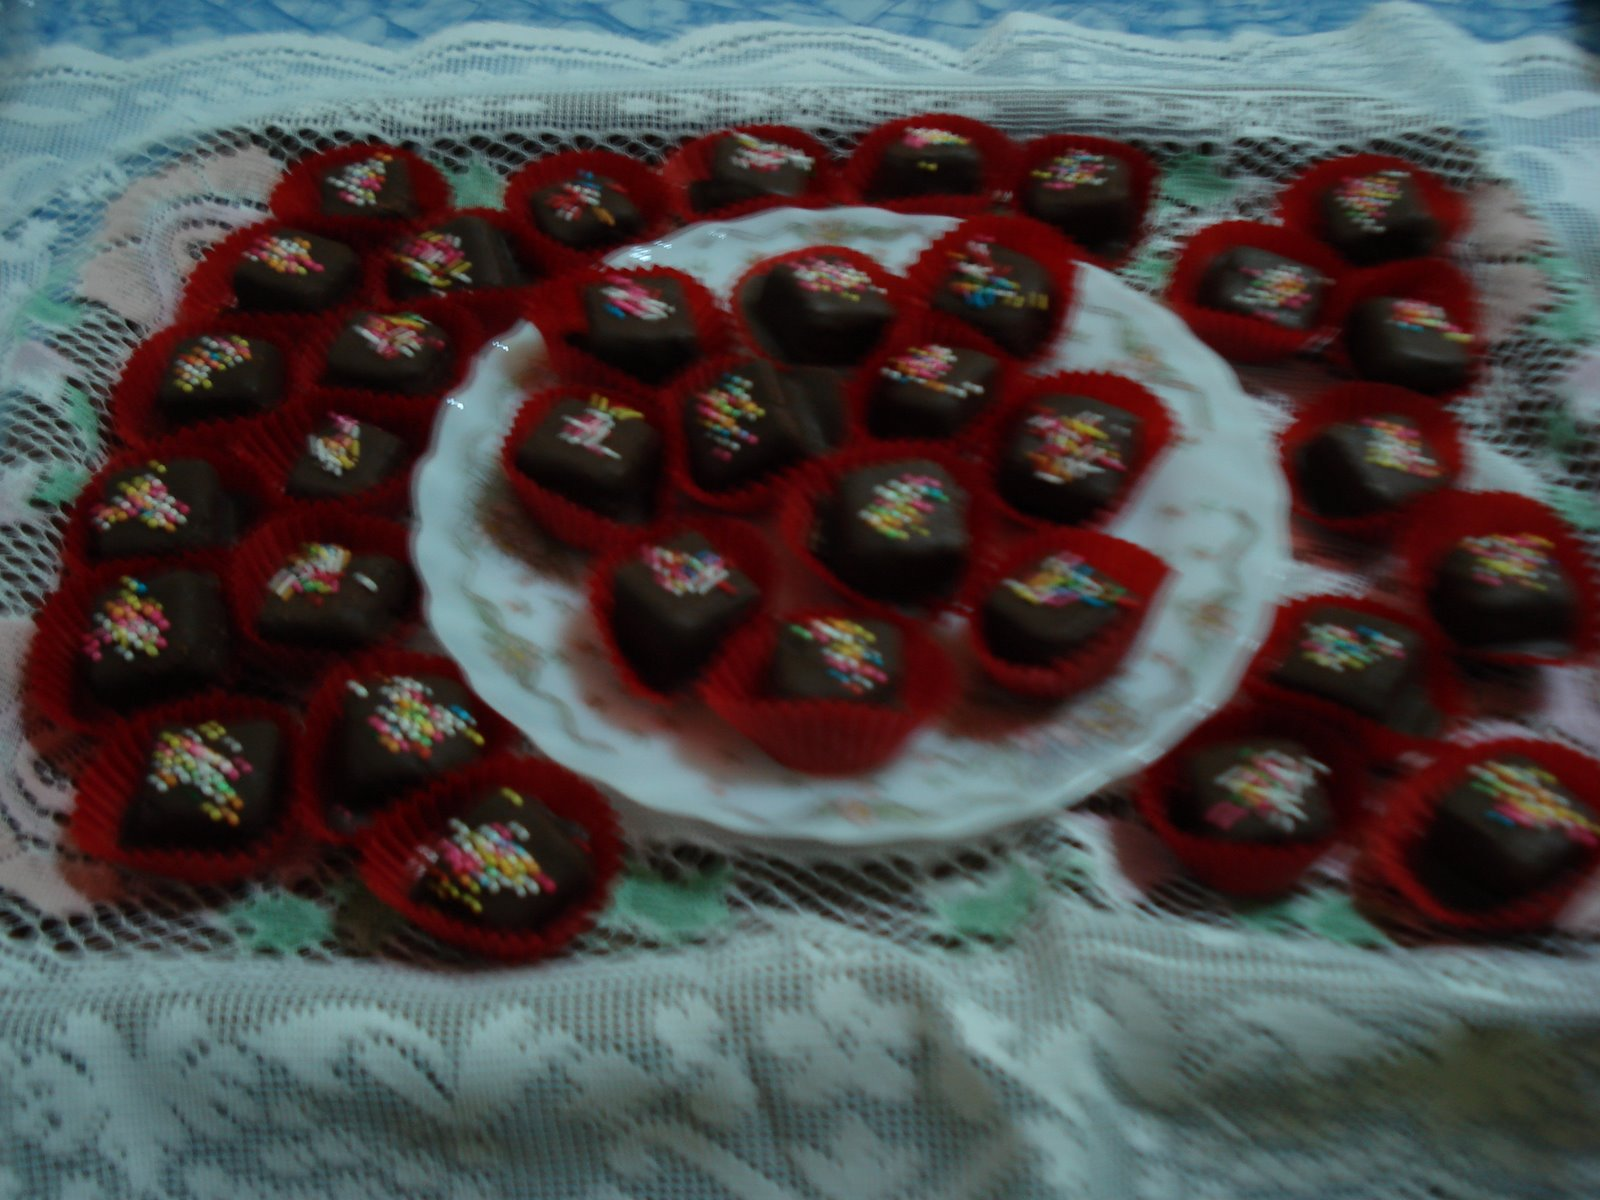 [Wafer+Chocolate+004.jpg]